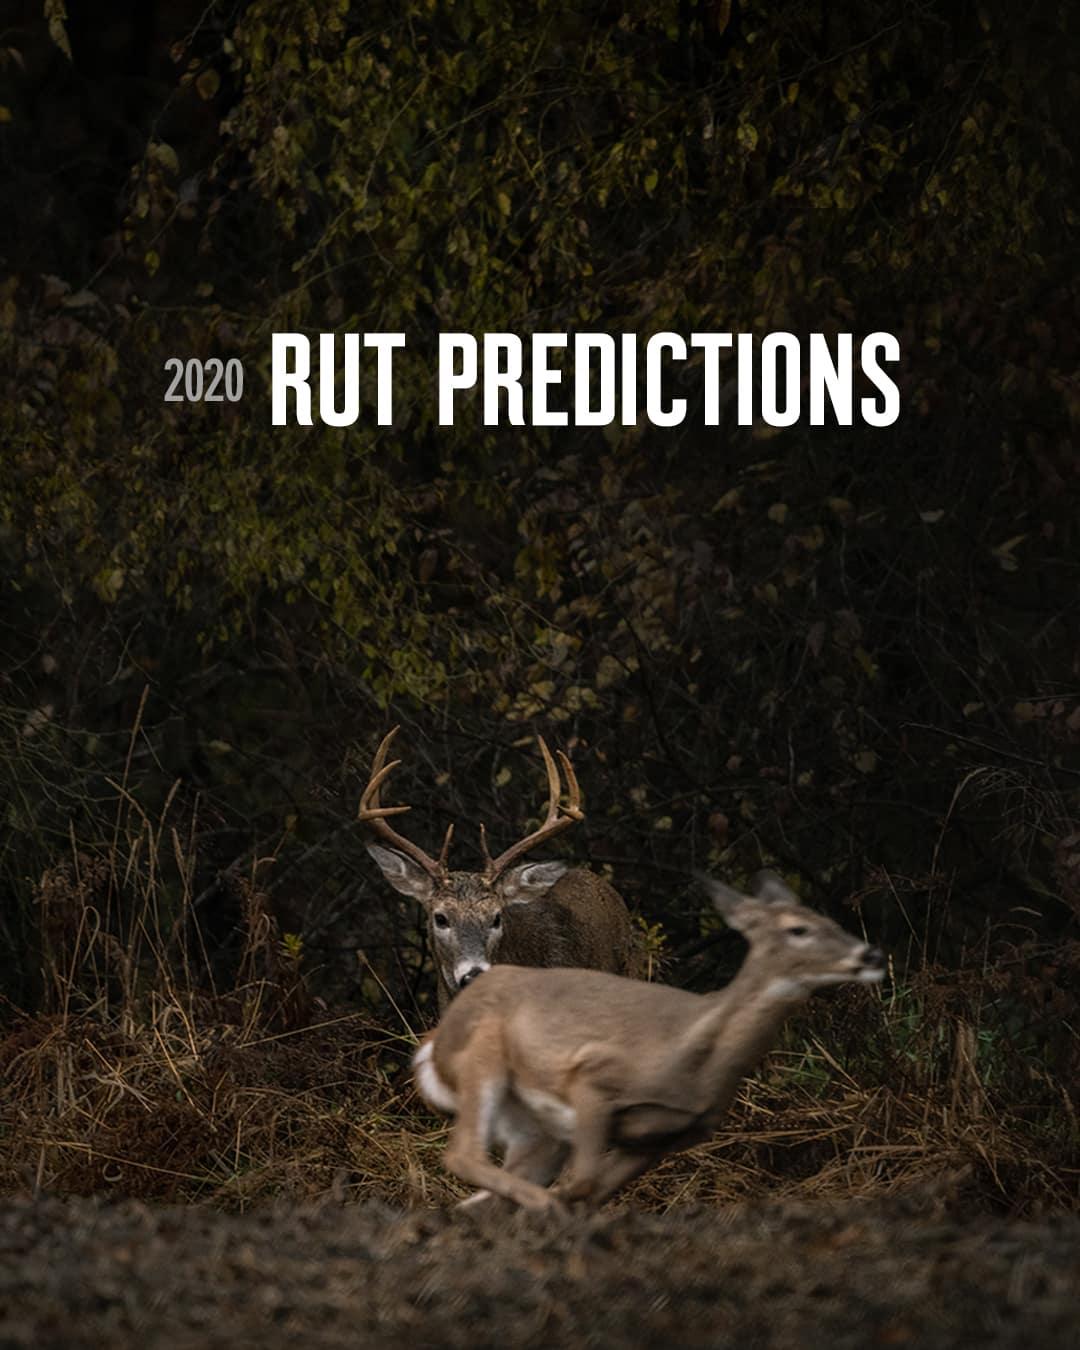 2020 Rut Predictions | Onx Maps regarding Whitetail Deer Rut Calendar